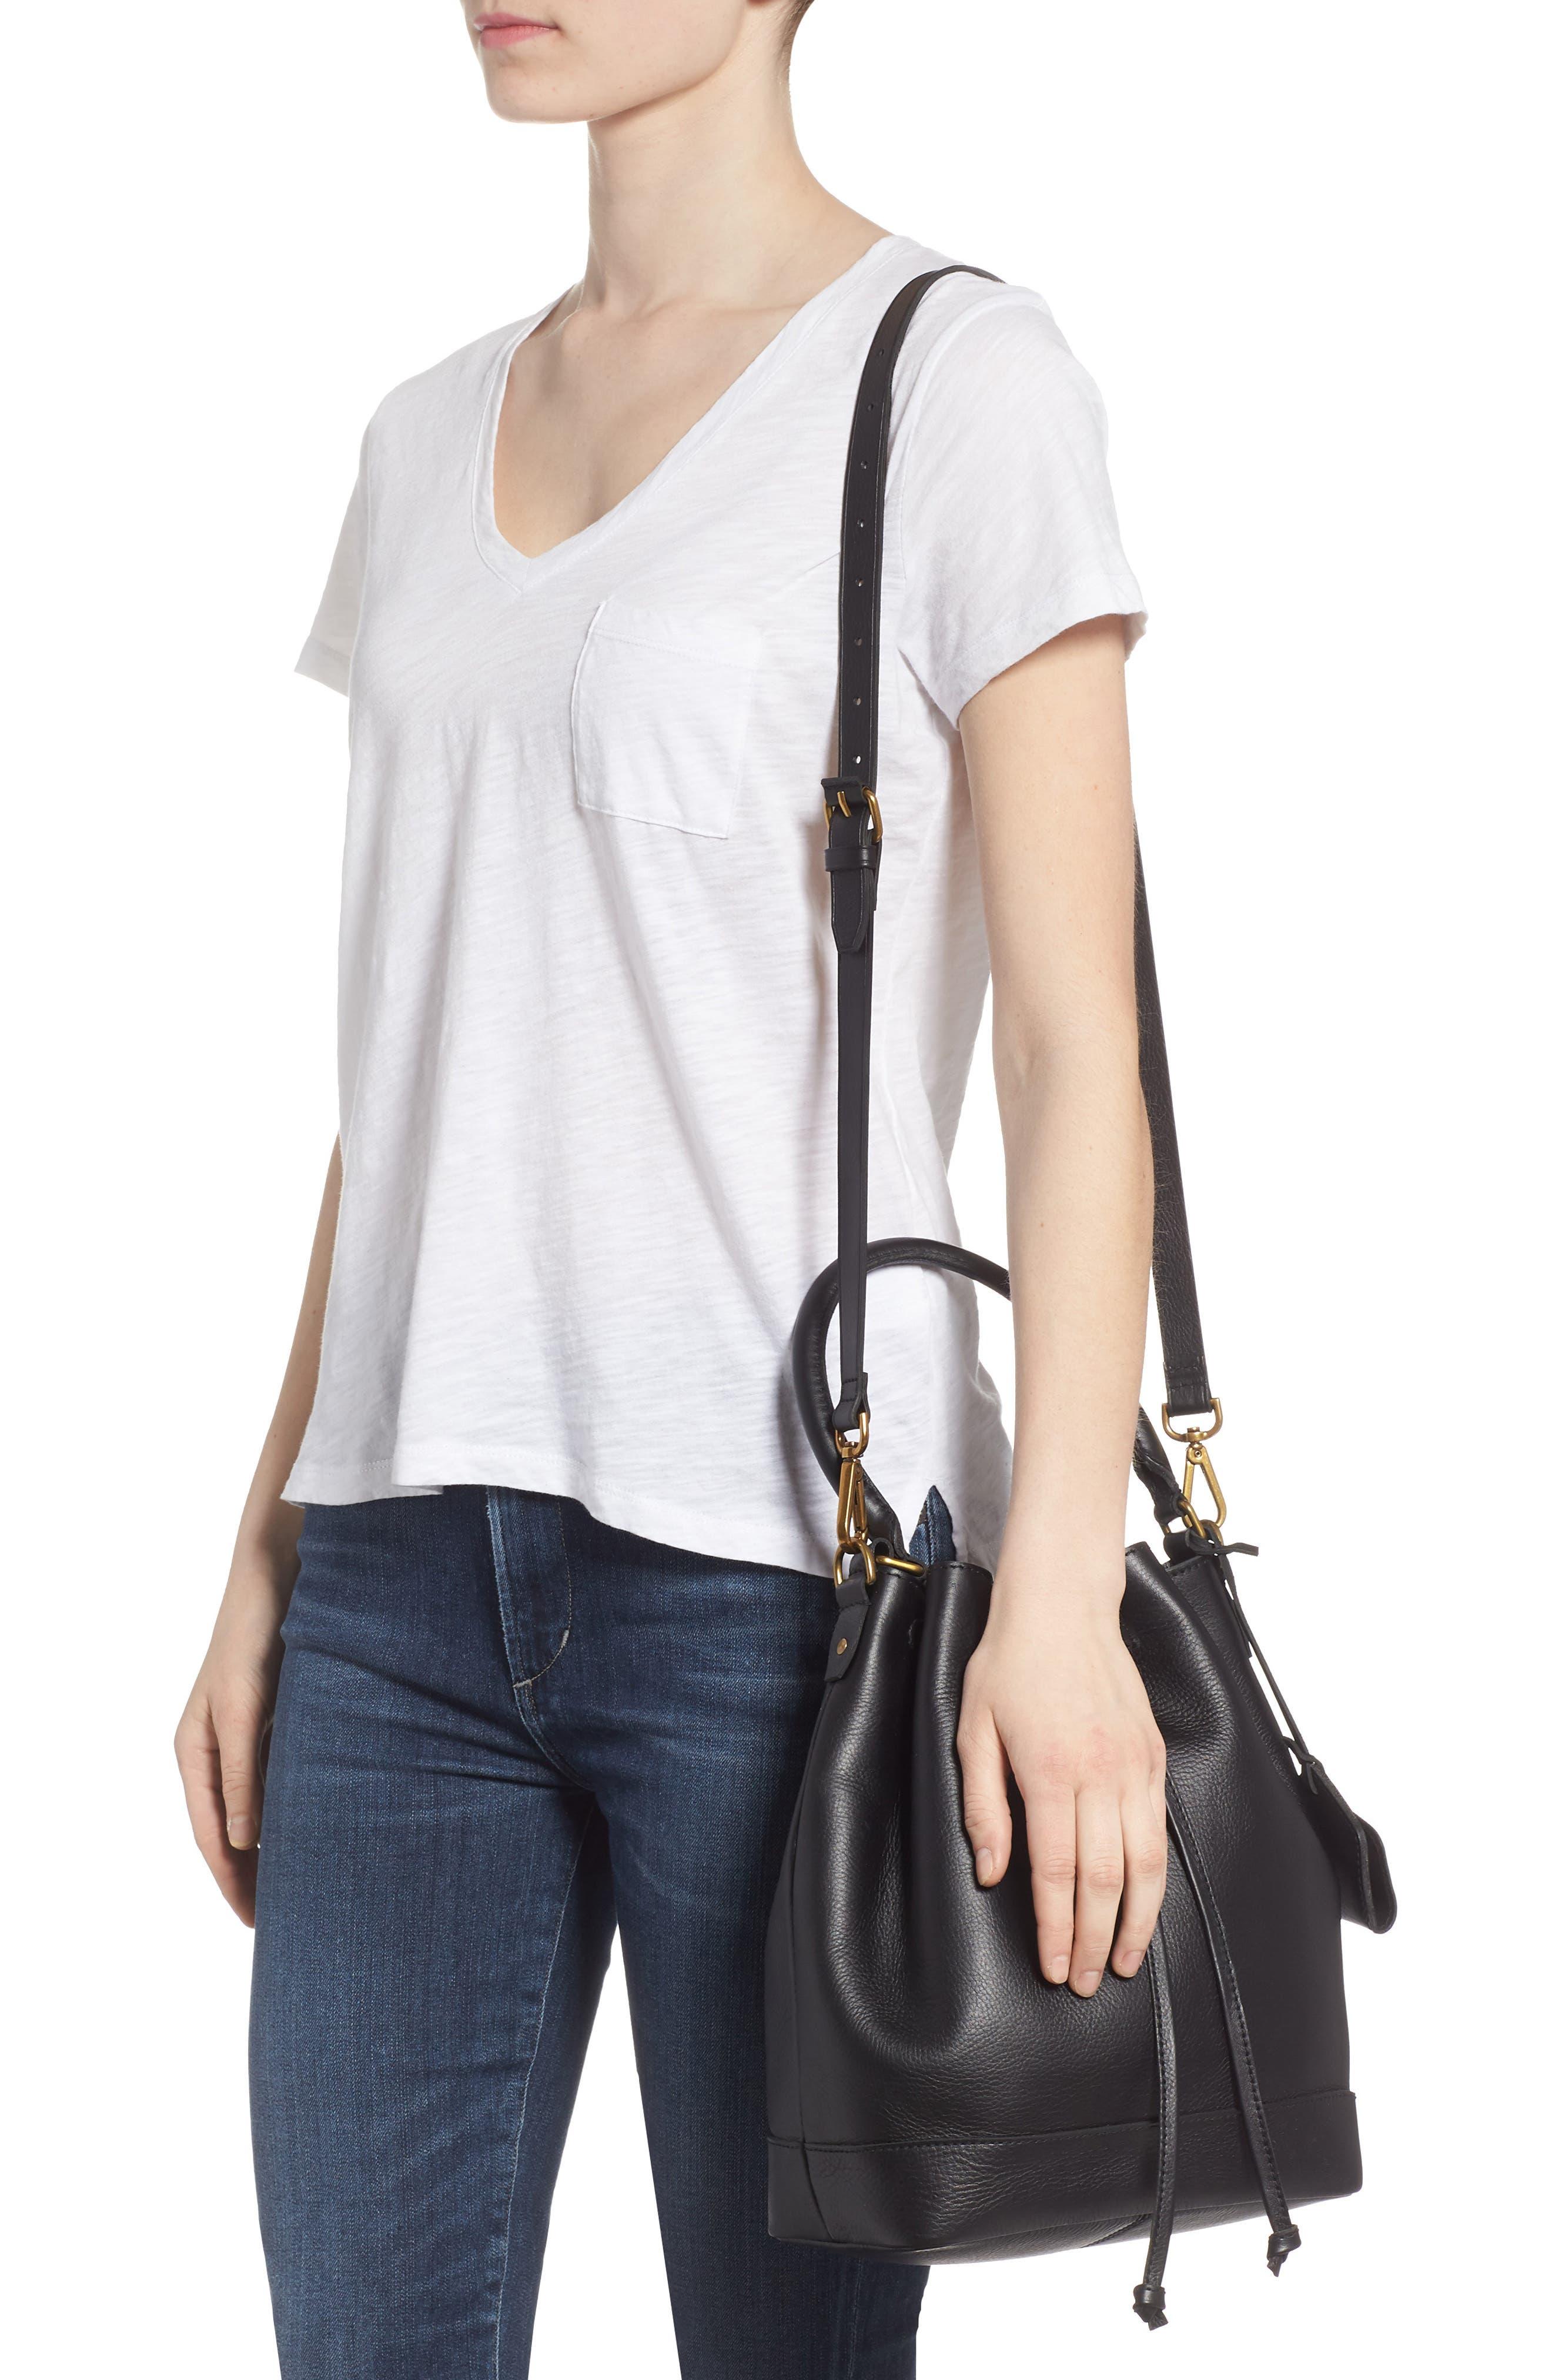 Lafayette Leather Bucket Bag,                             Alternate thumbnail 2, color,                             True Black